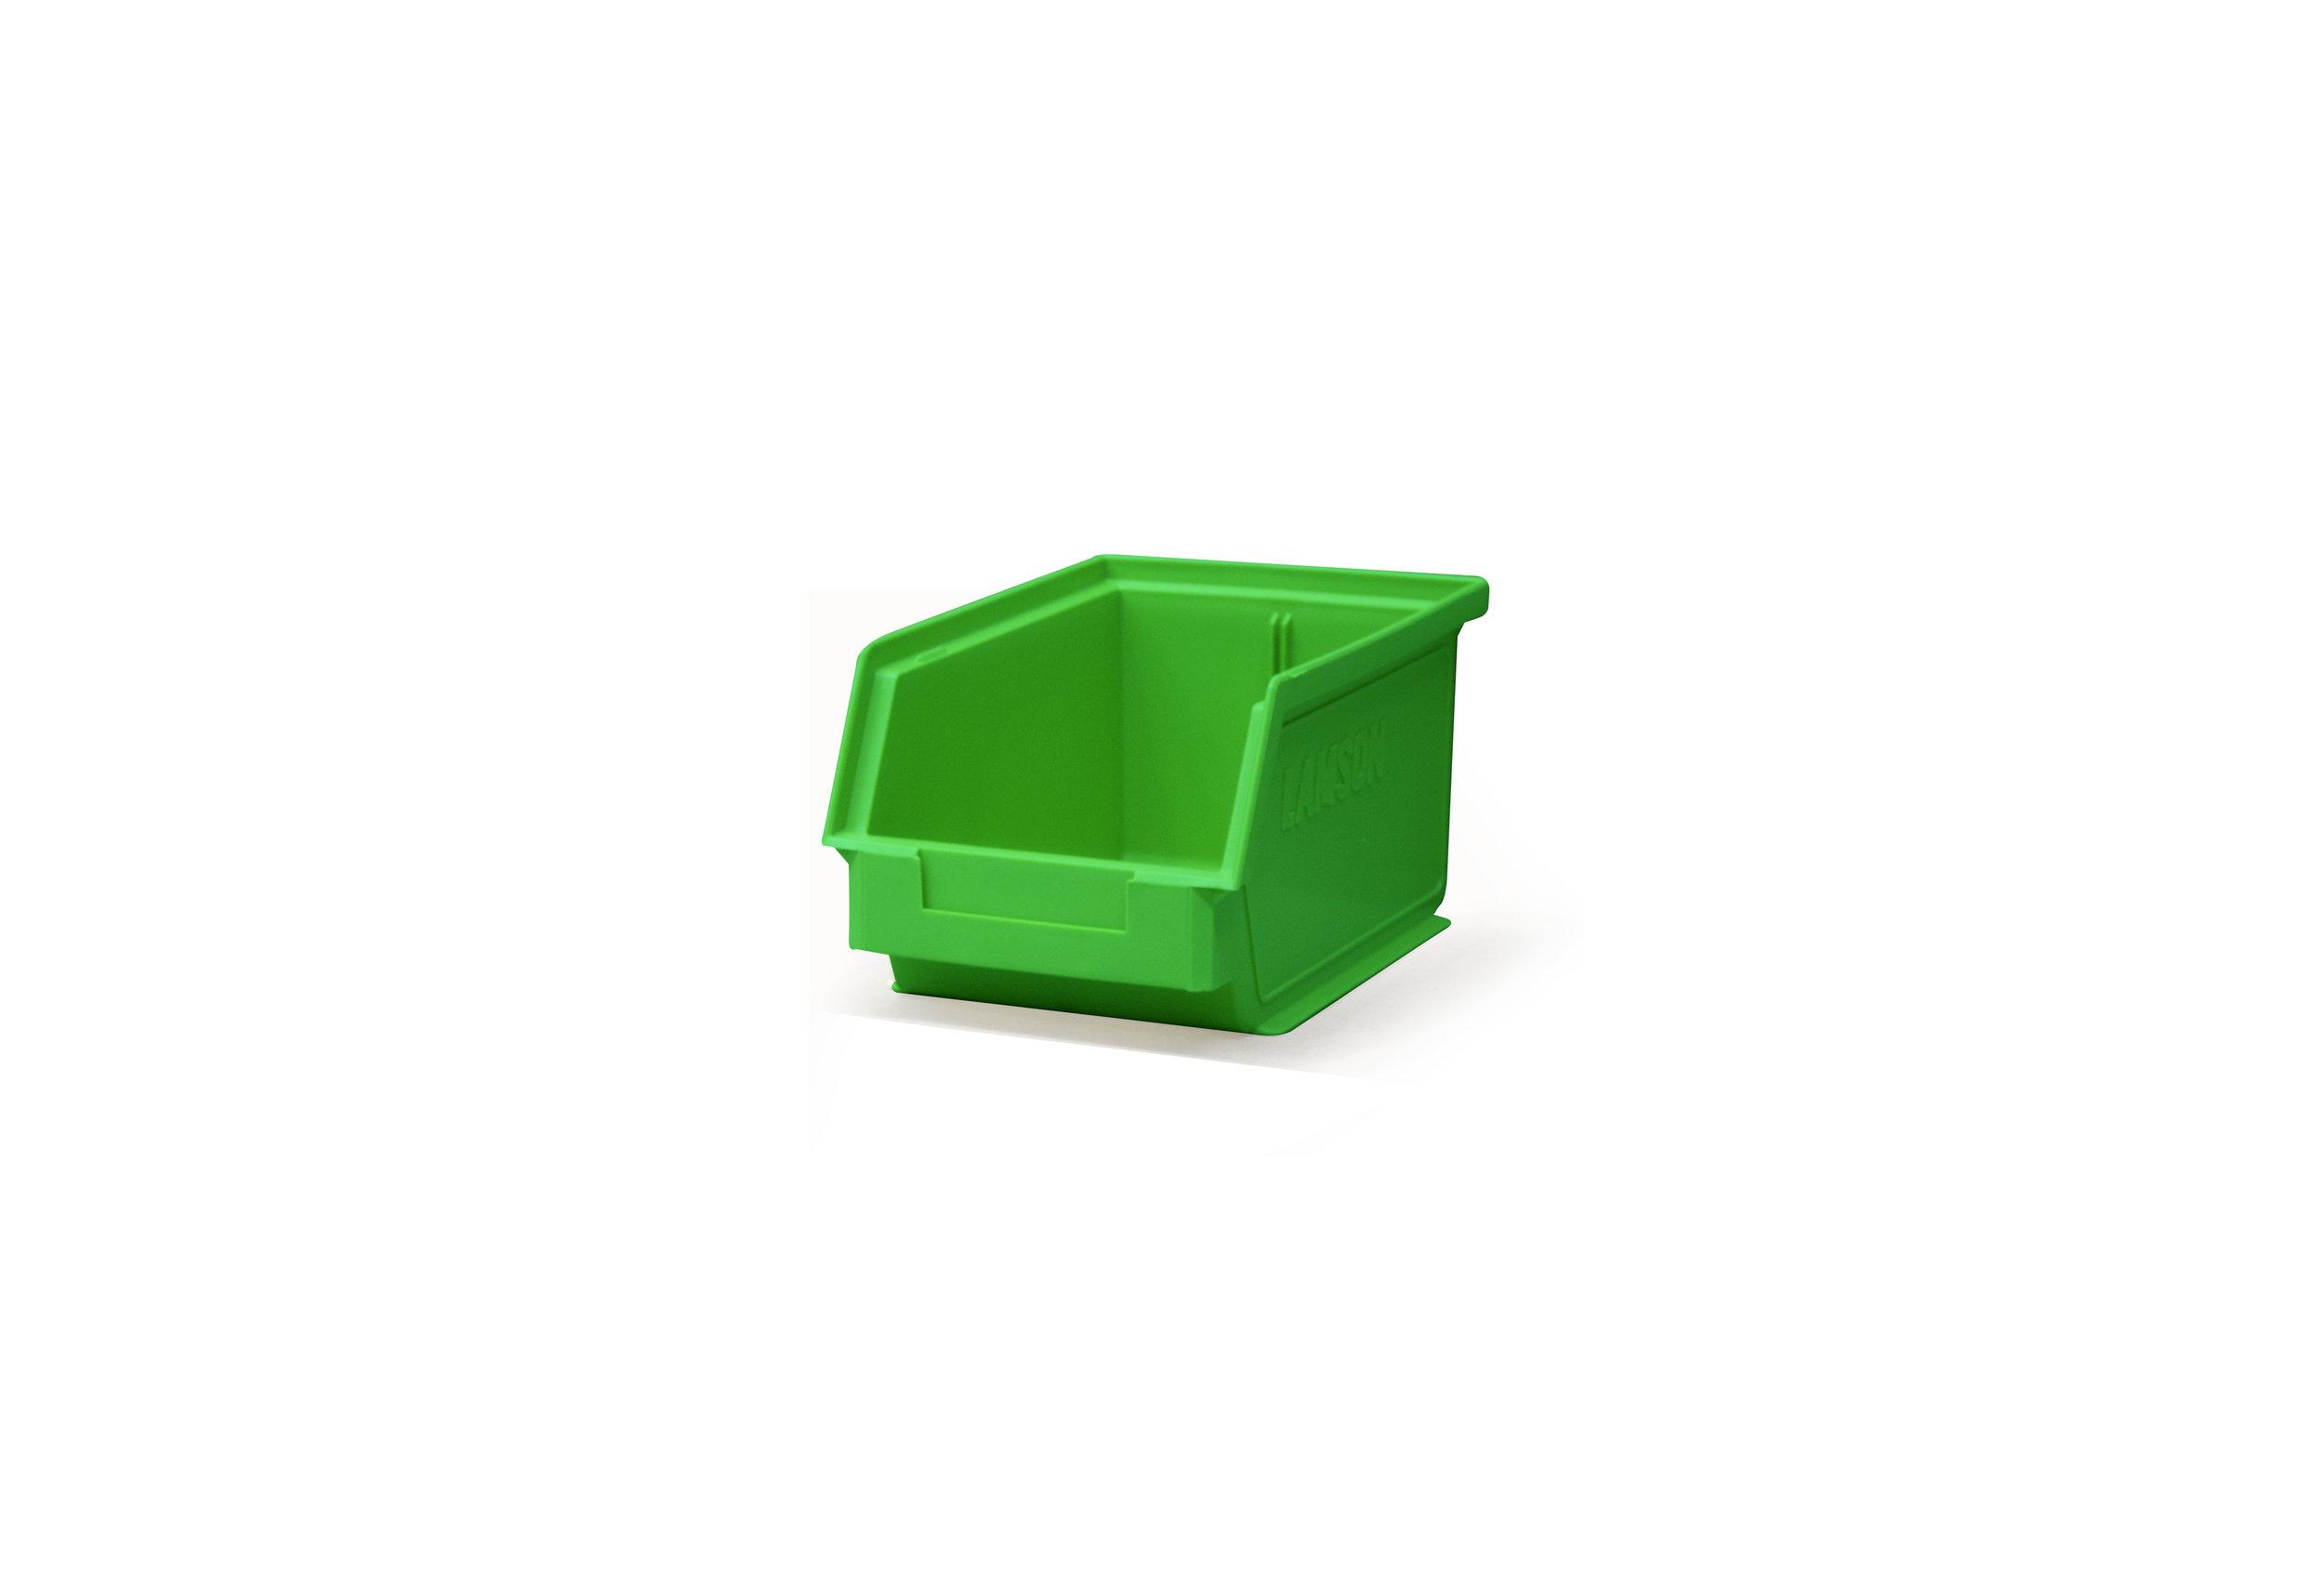 Size 4 Green (Image 1).jpg